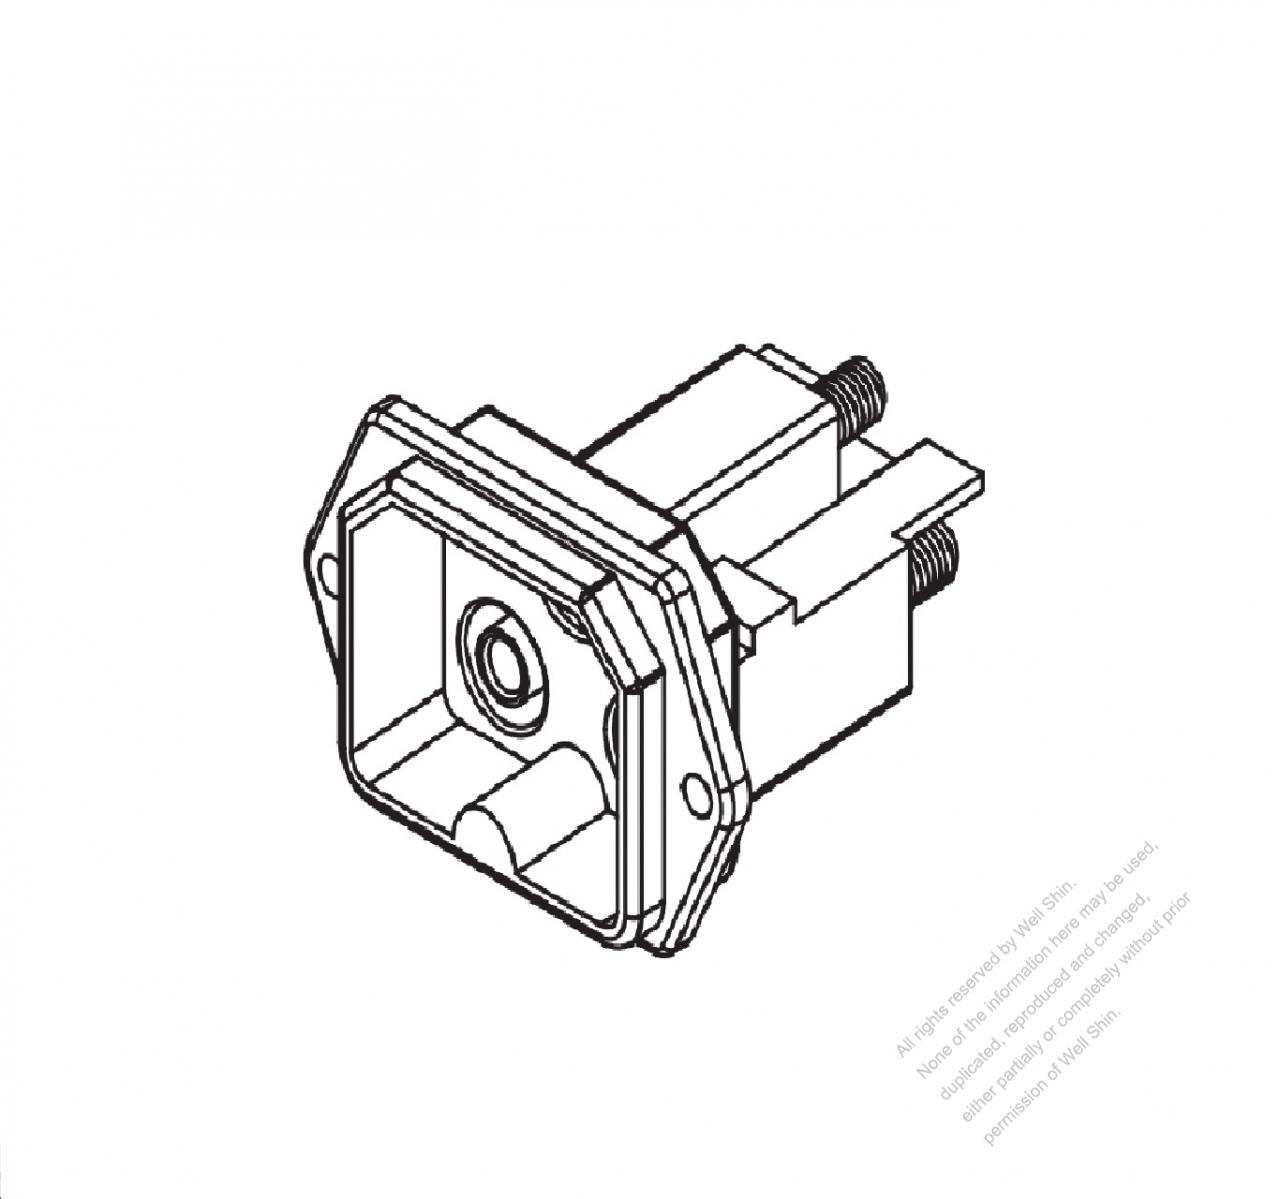 25a 3 Pin Outlet Well Shin Technology Co Ltd